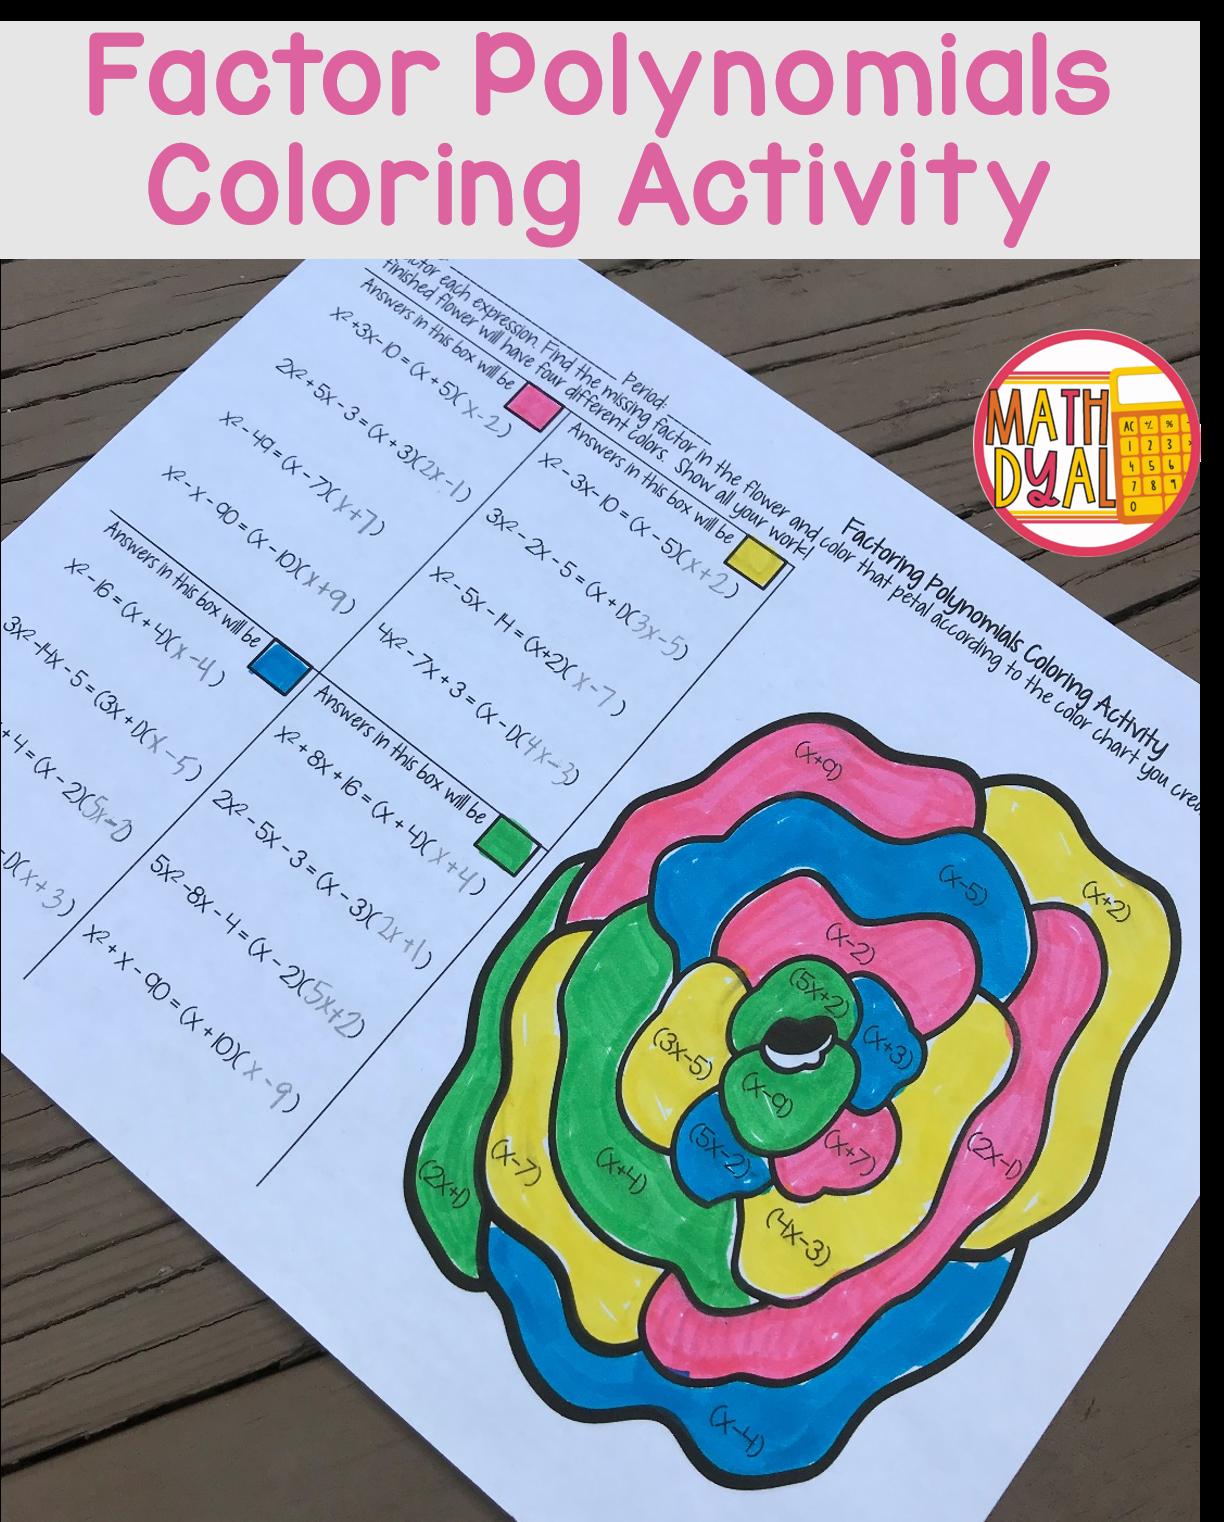 Factor Polynomials Coloring Activity Color Activities Polynomials Middle School Math [ 1522 x 1224 Pixel ]